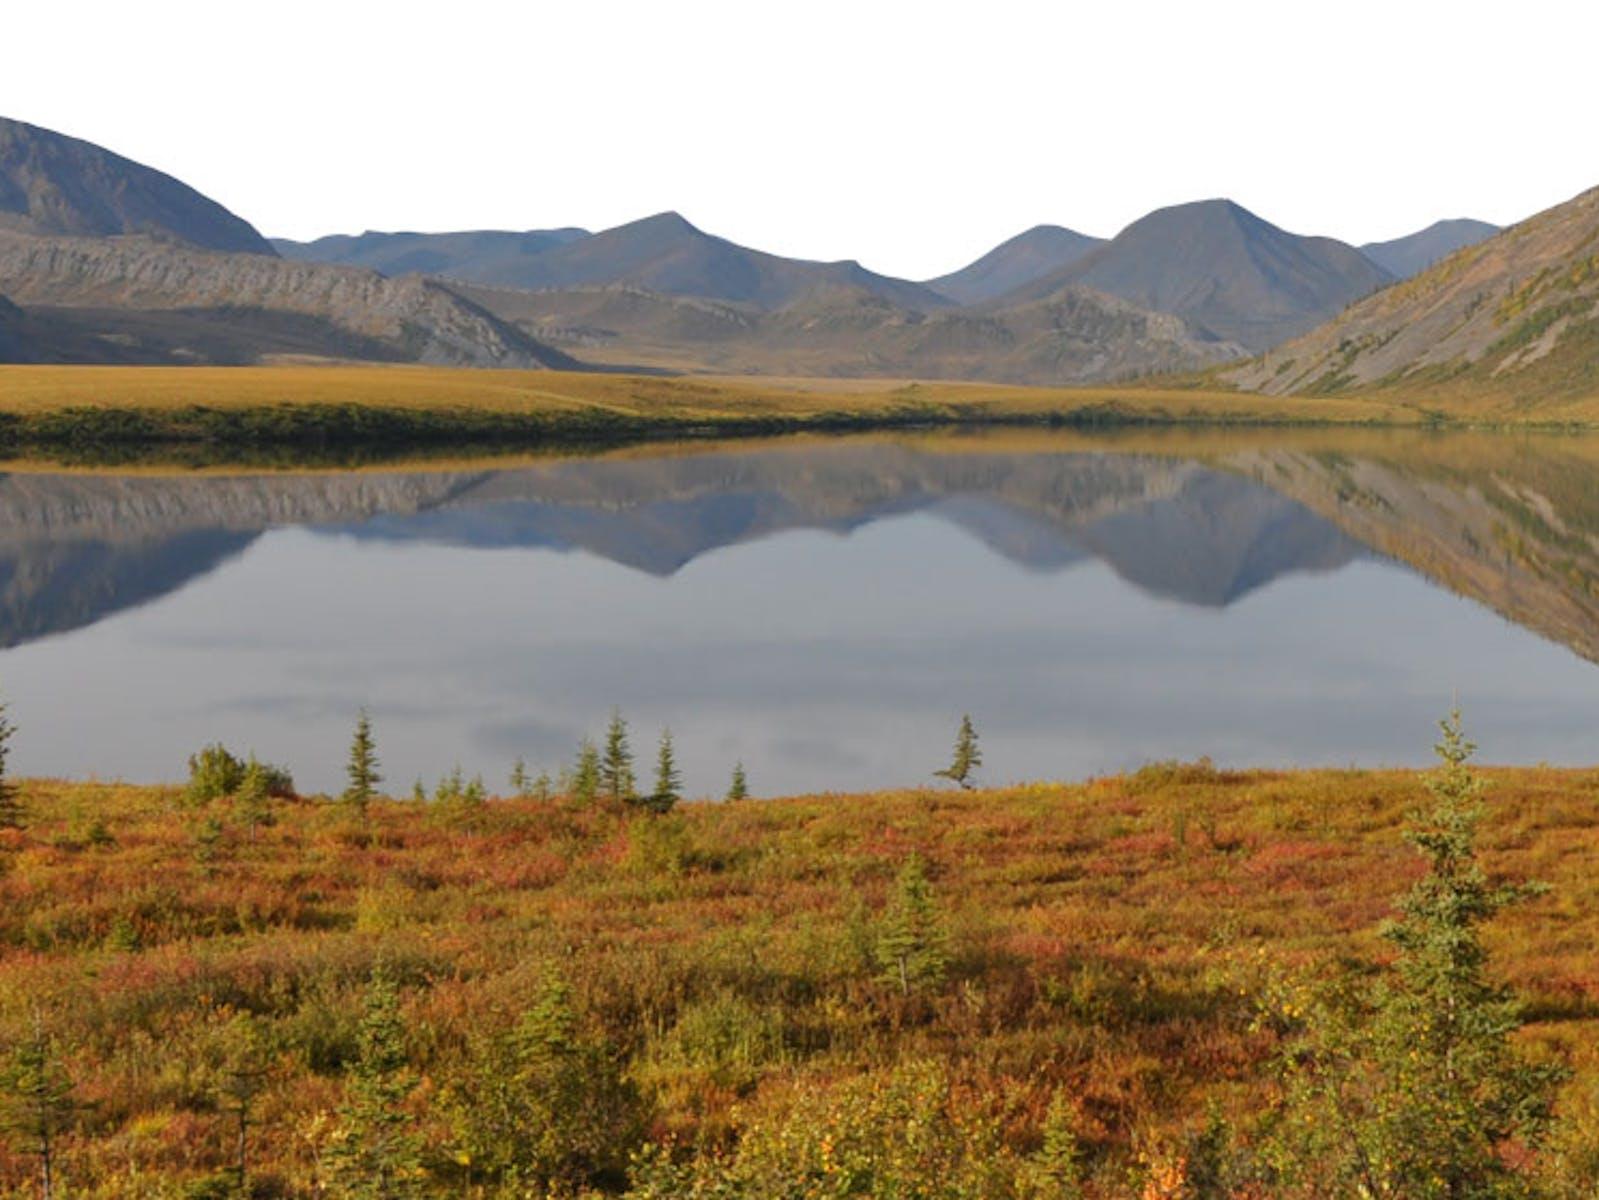 Horn Lake, Mackenzie River Basin, Northwest Territories